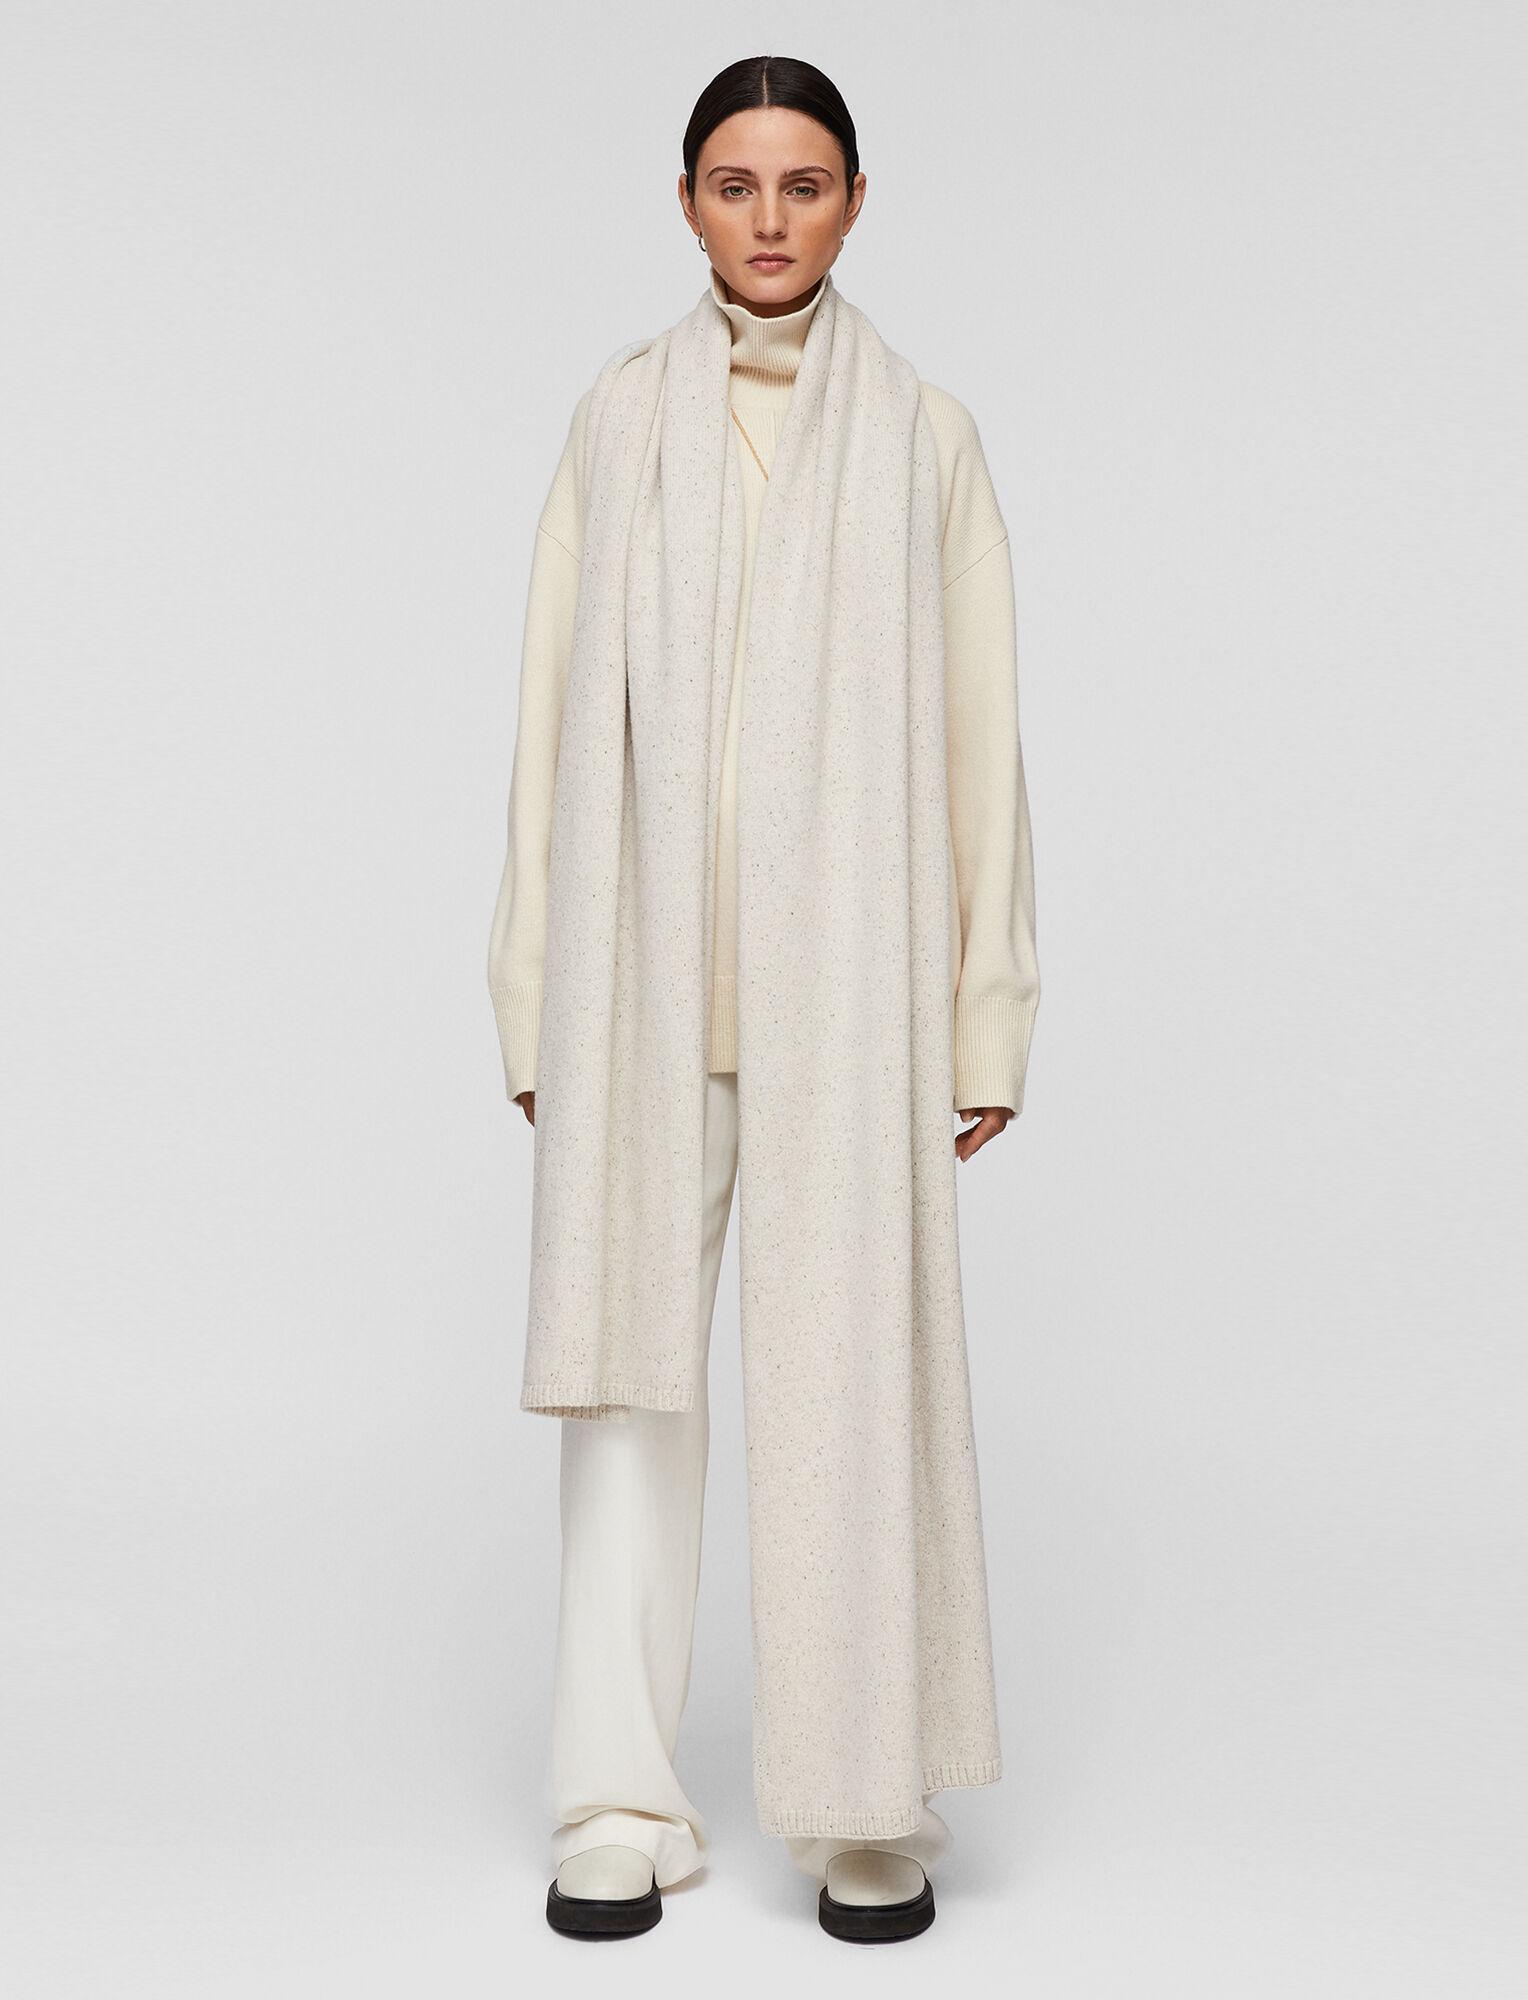 Joseph, Tweed Knit Plaid Scarf, in SANDSHELL